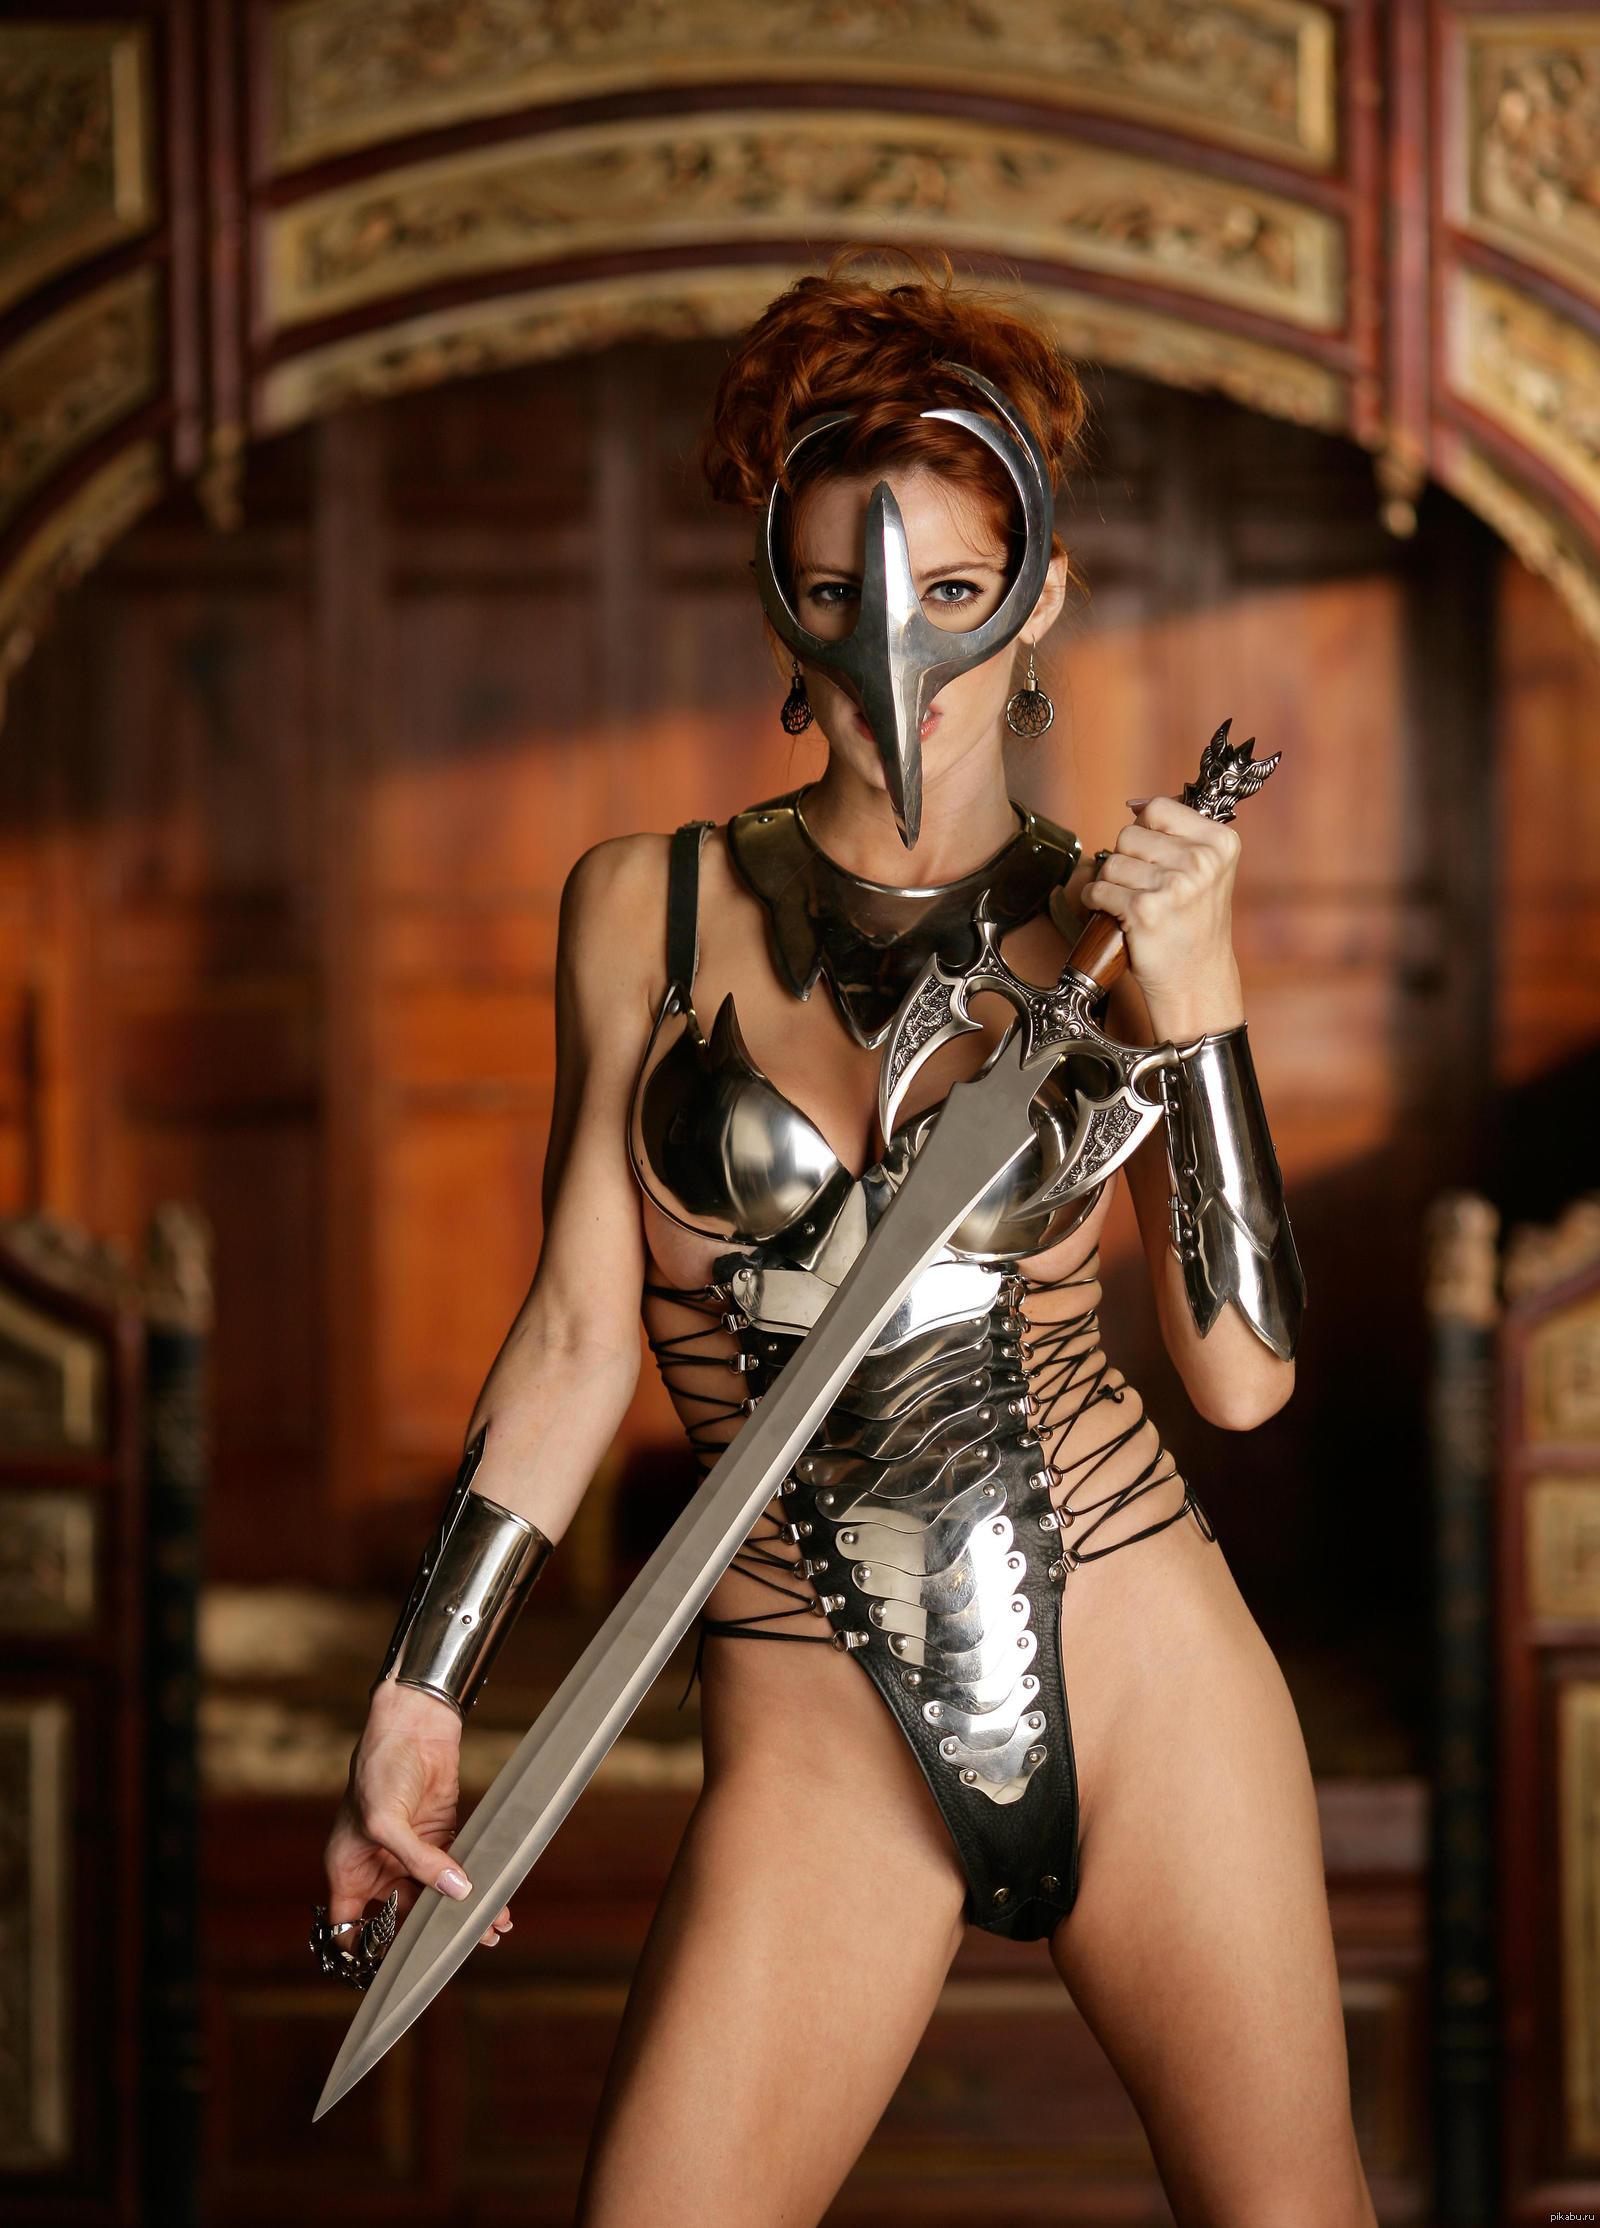 Sexy fantasy armor hardcore comic